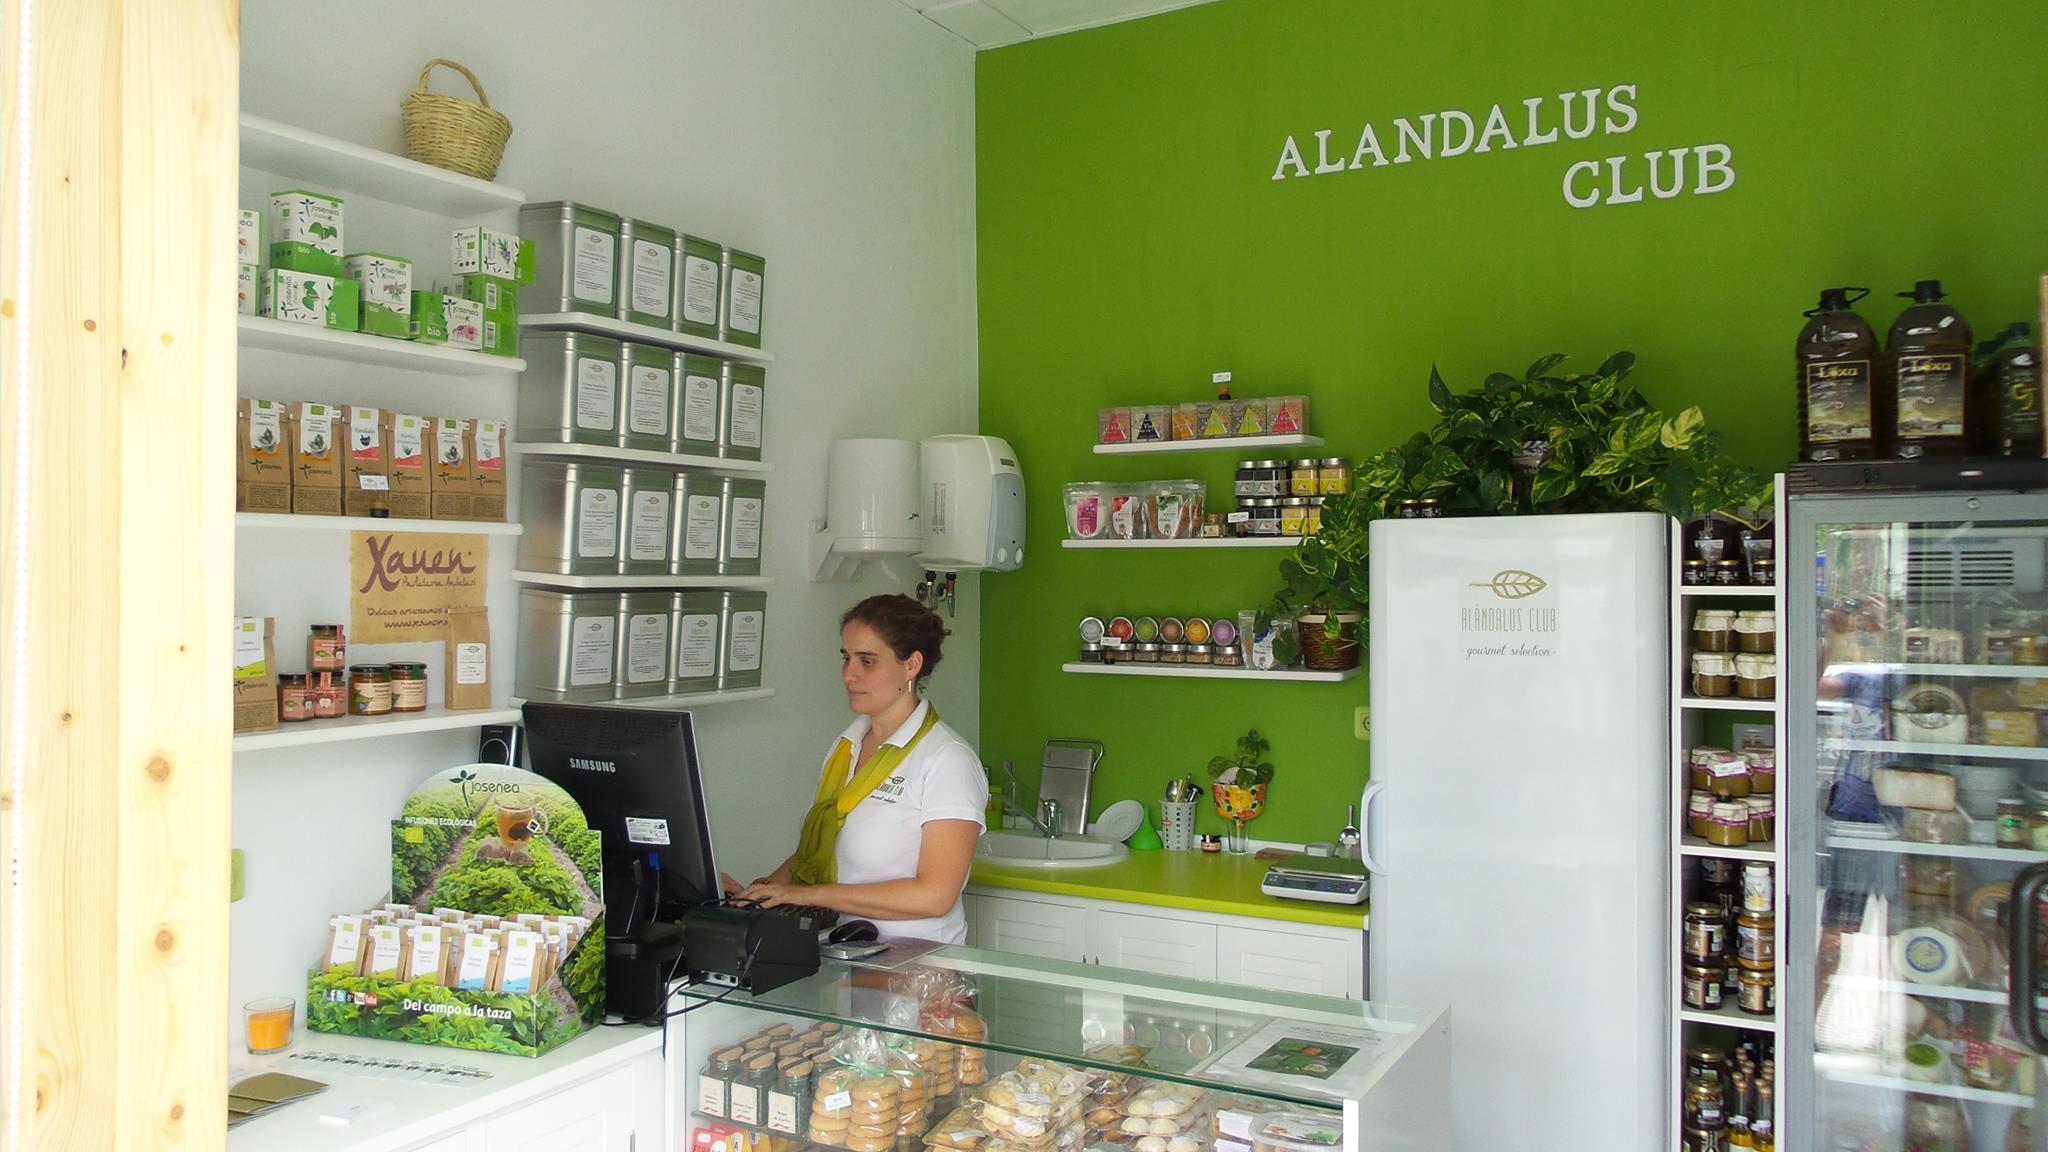 Alandalus Club Gourmet Selection